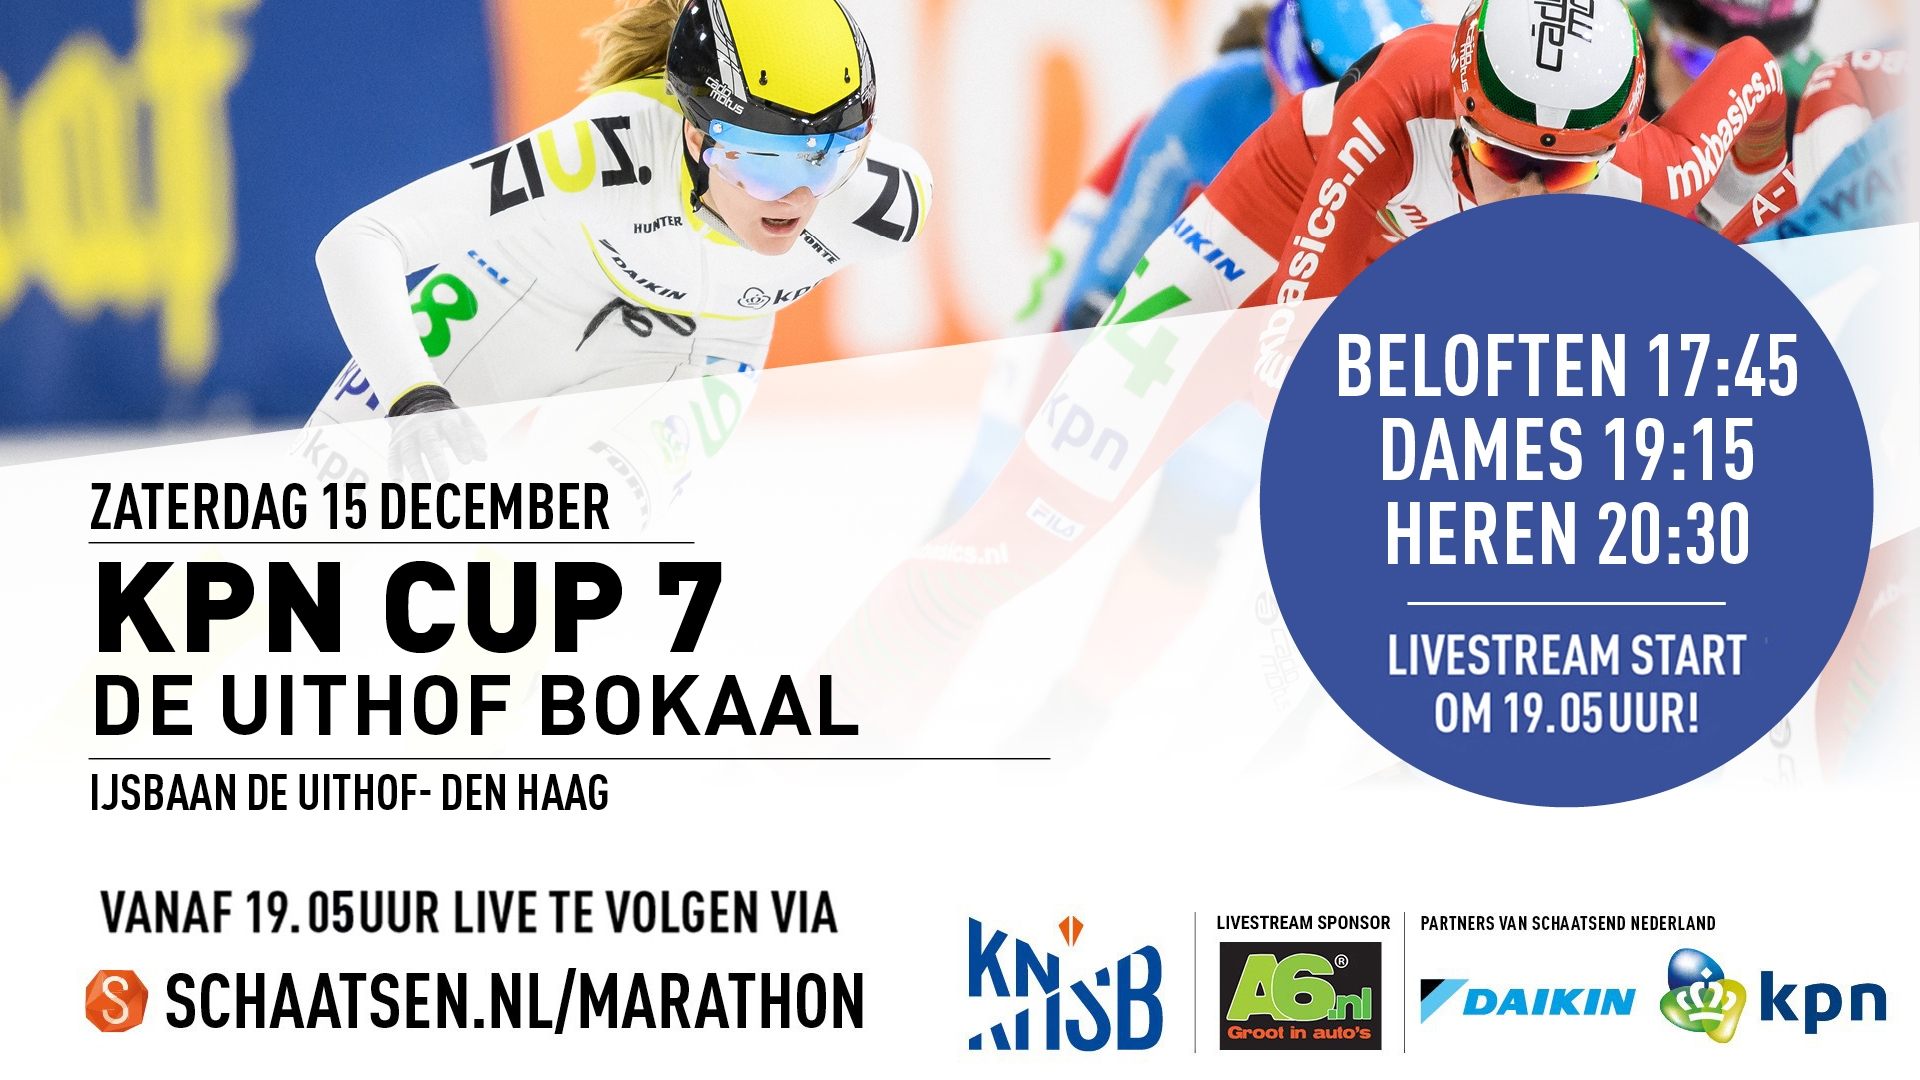 Livestream kpn marathon cup 7 den haag 15 december 2018